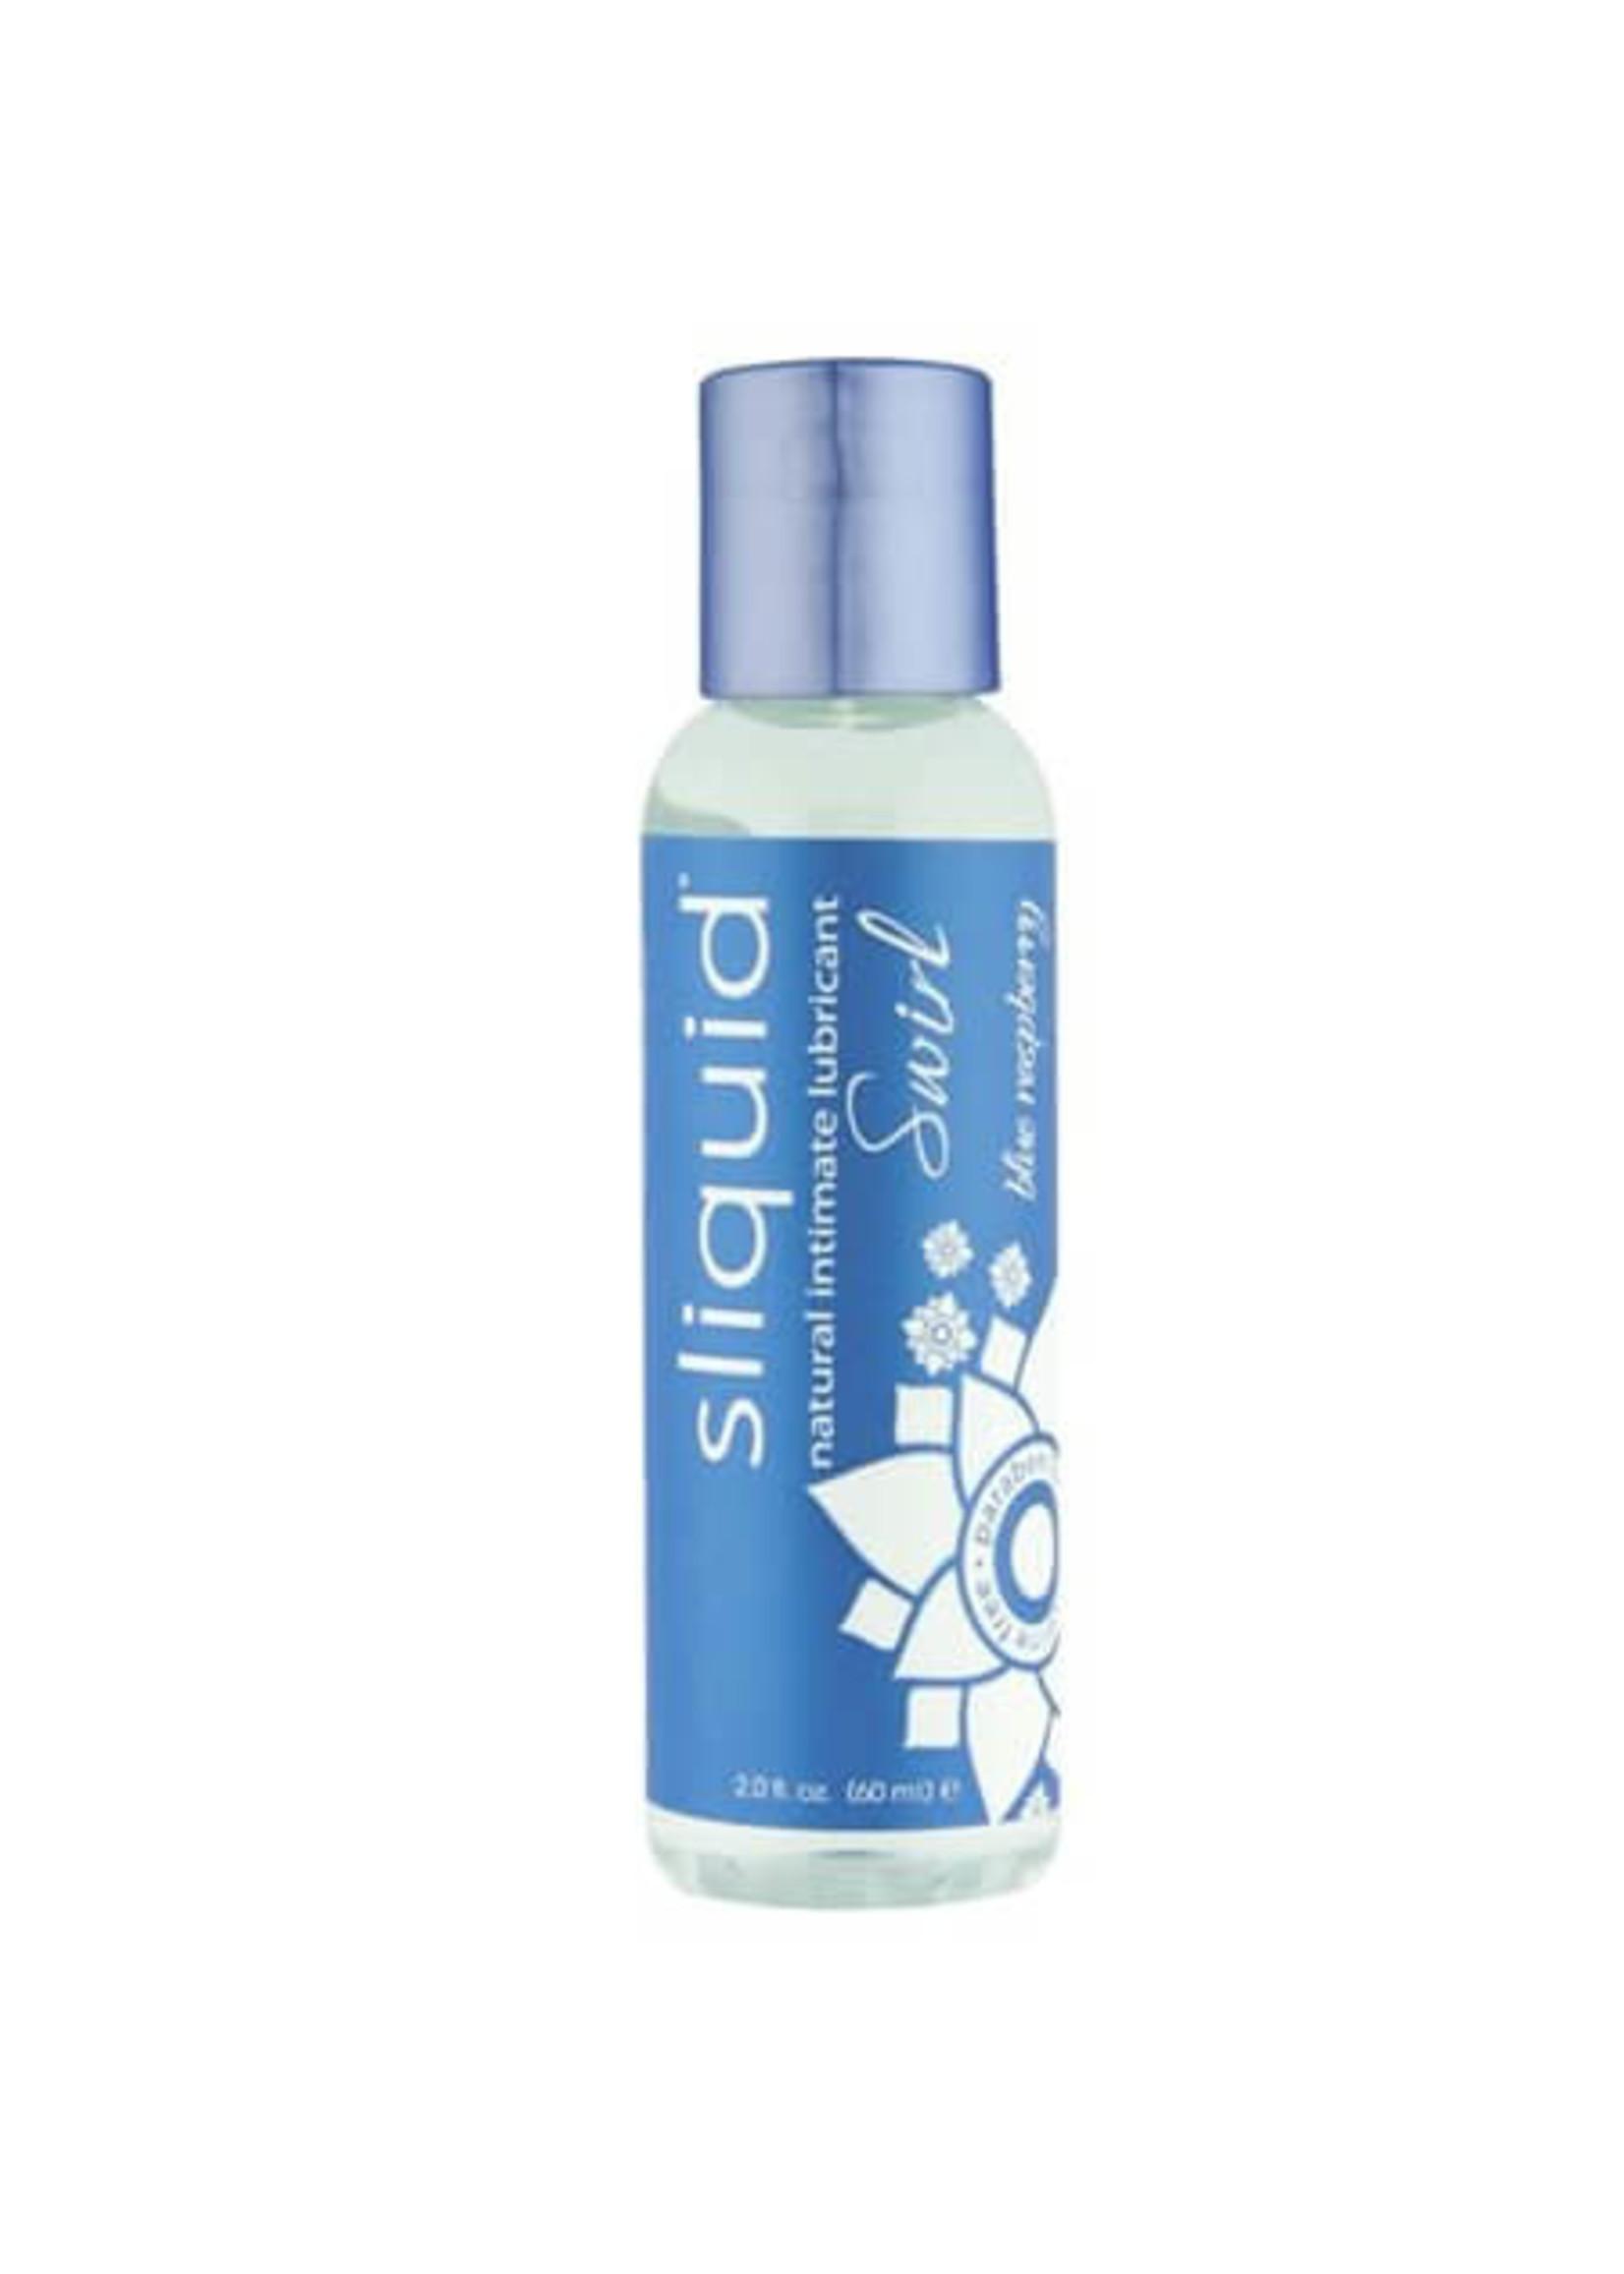 Sliquid SLIQUID BLUE RASPBERRY 2OZ single